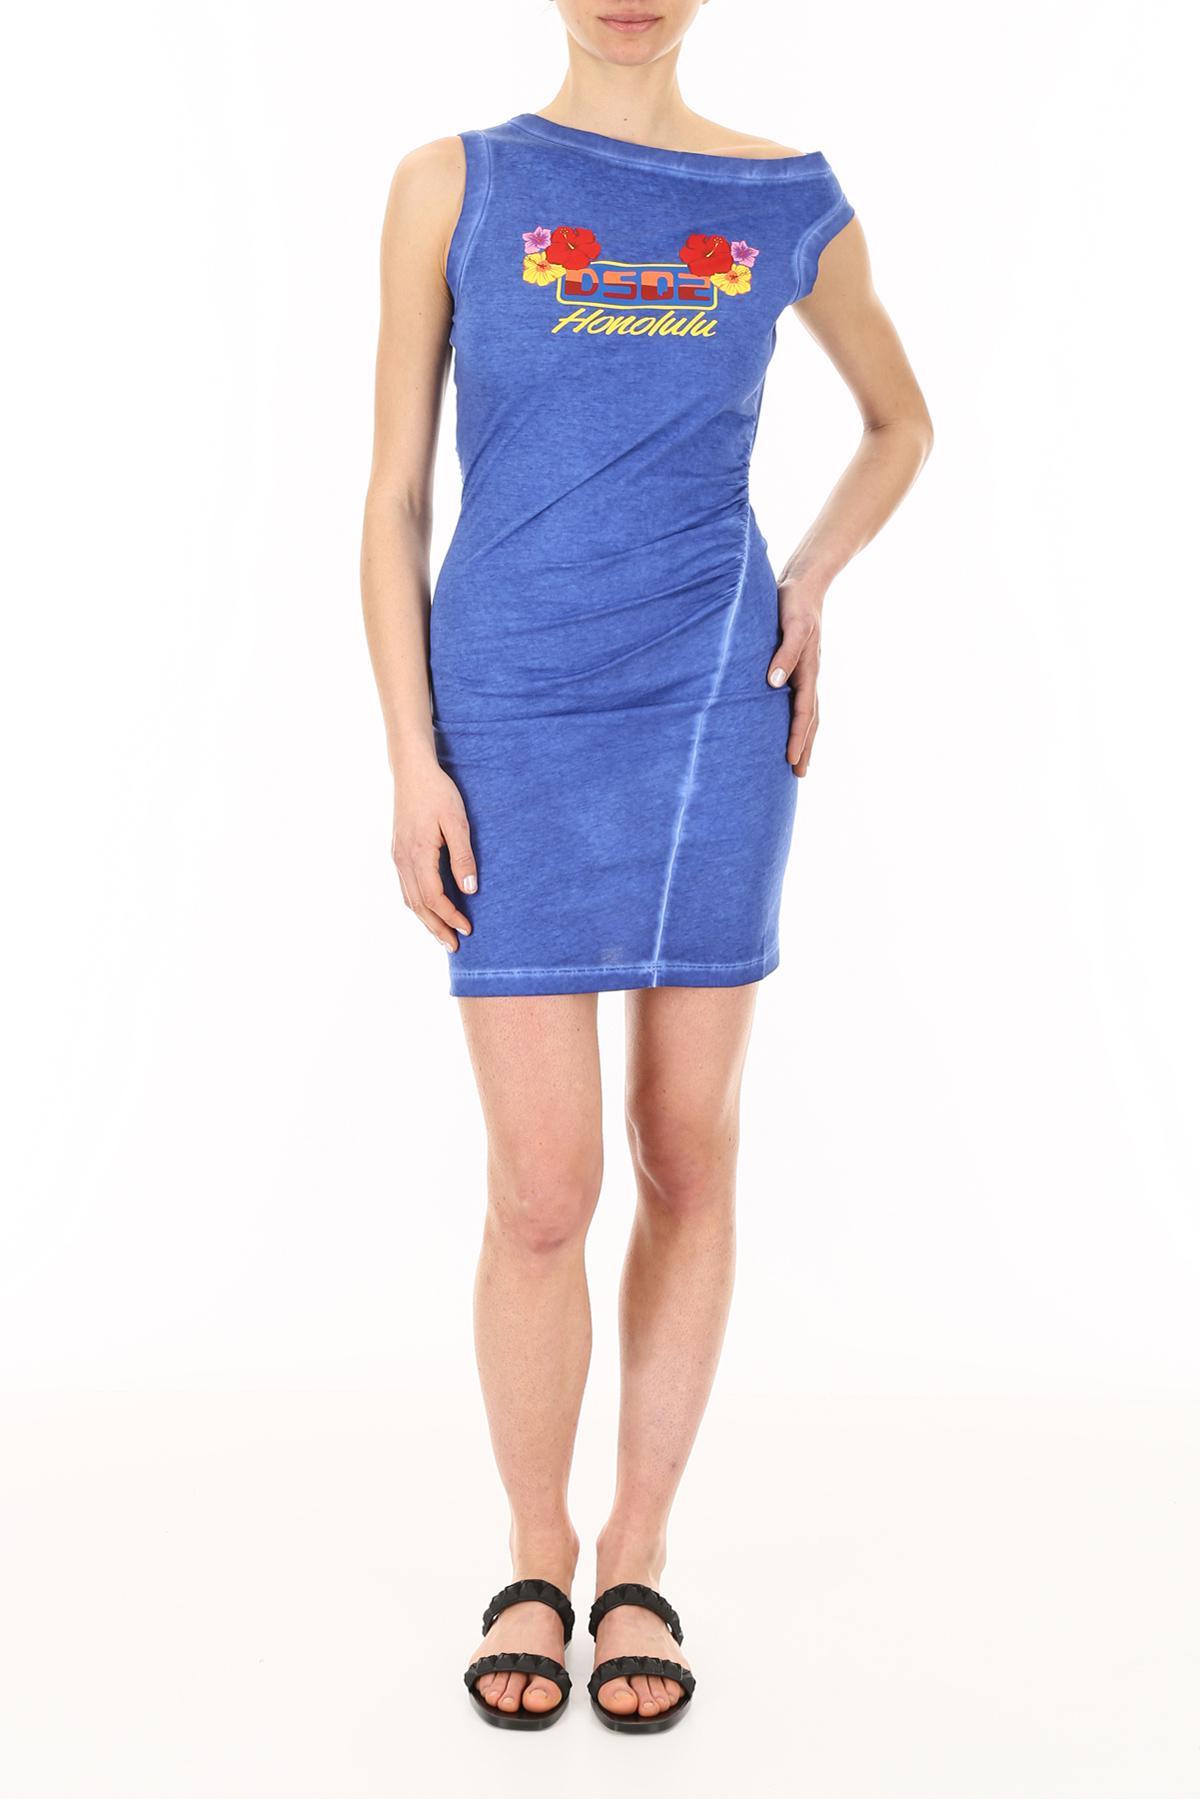 c901155262 dsquared-BLU-Printed-Jersey-Dress.jpeg